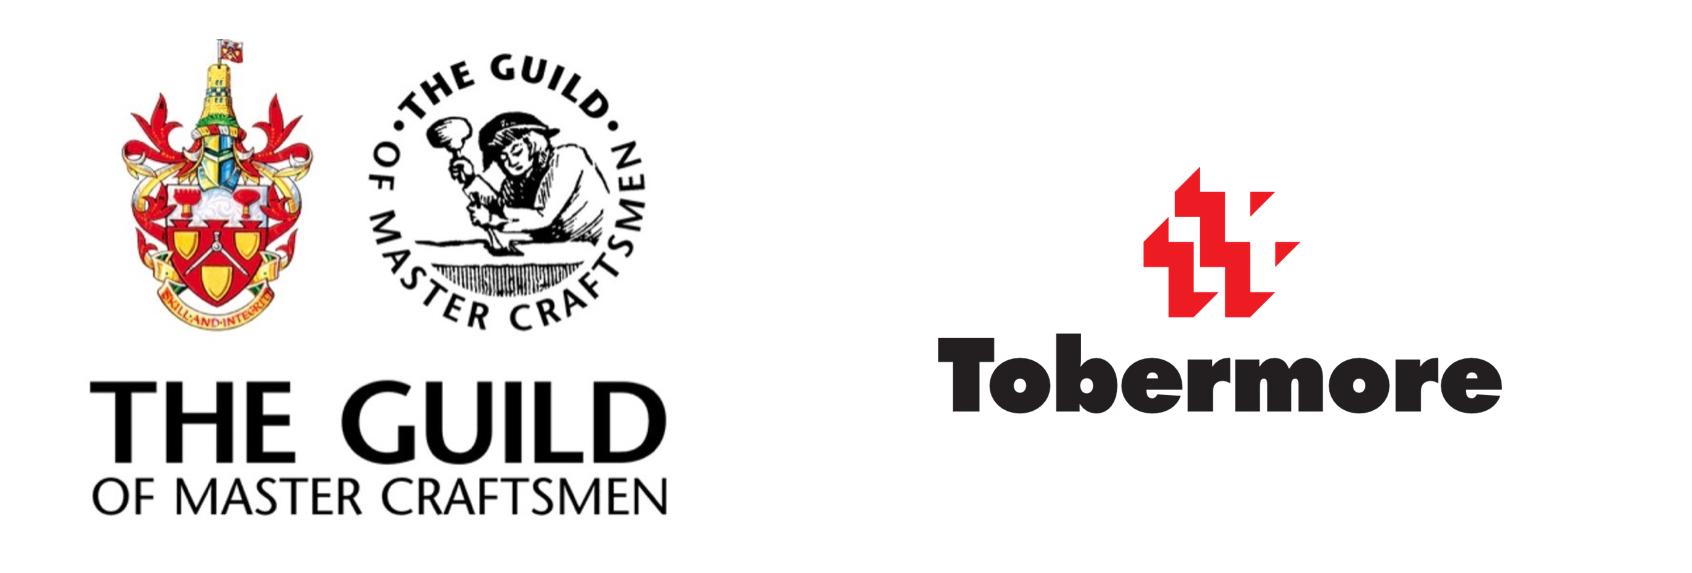 Guild of Master Craftsmen and Tobermore